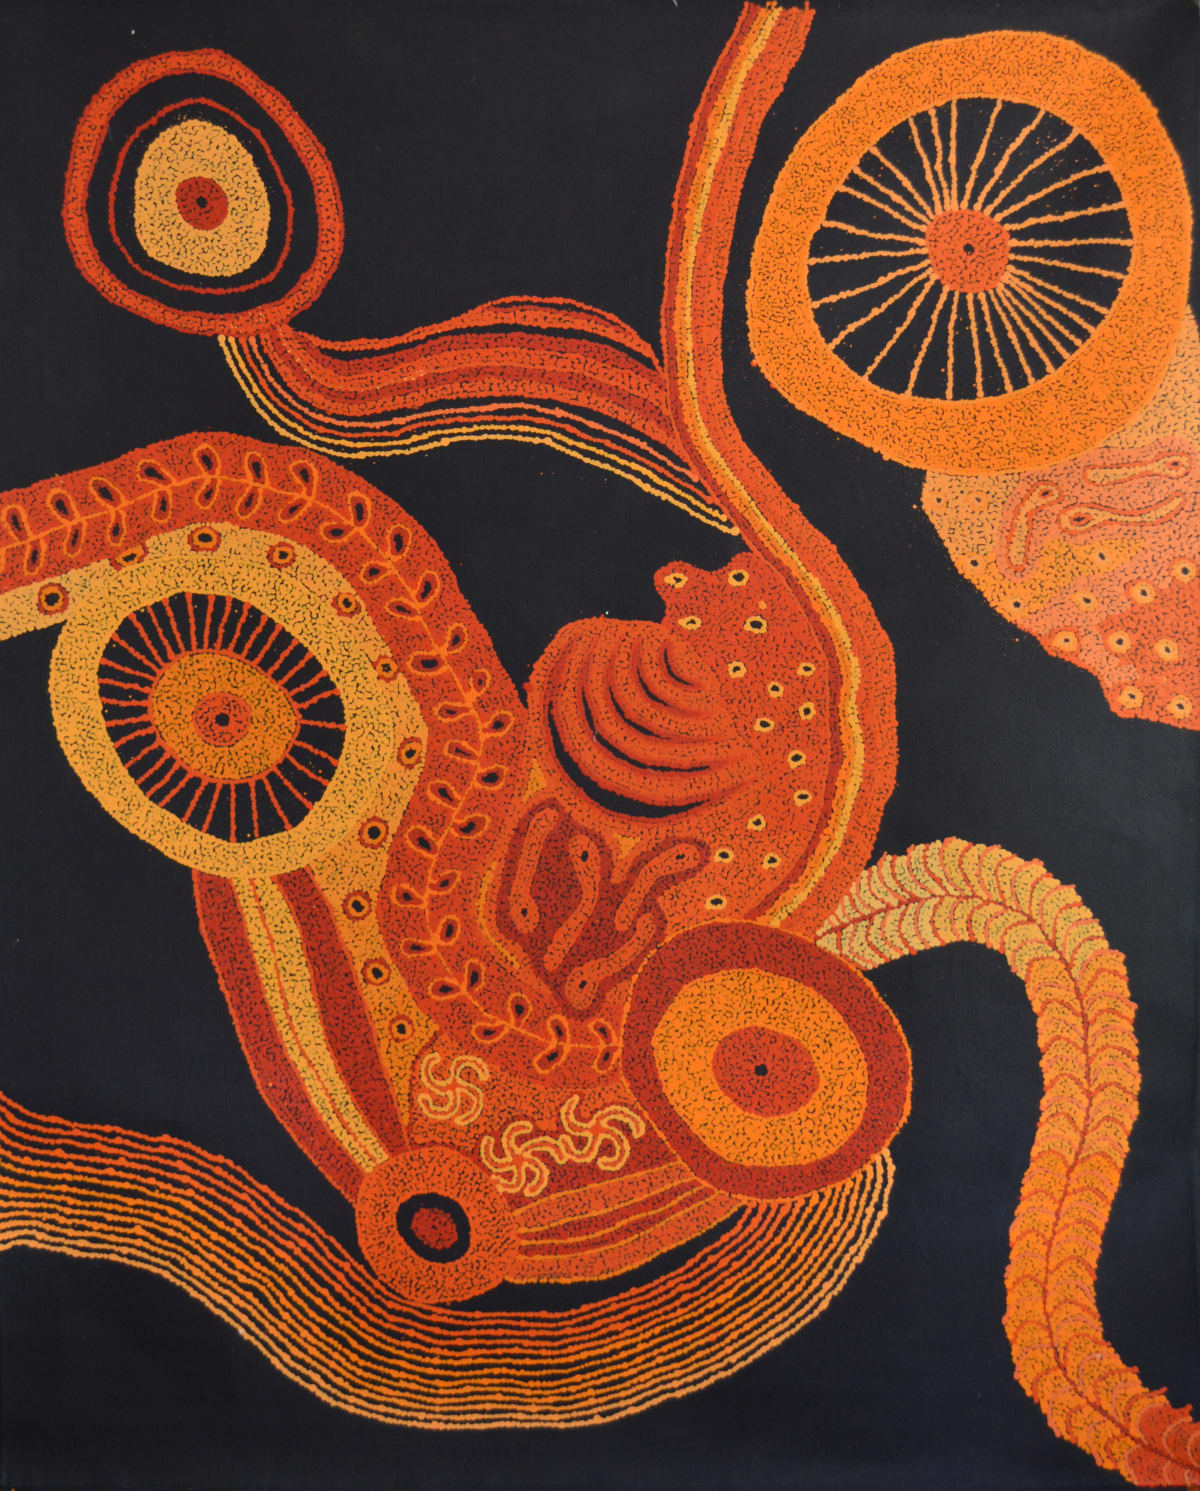 Marina Warari Brown Pumani Ngayuku Ngura (My Home) acrylic on linen 152 x 122 cm